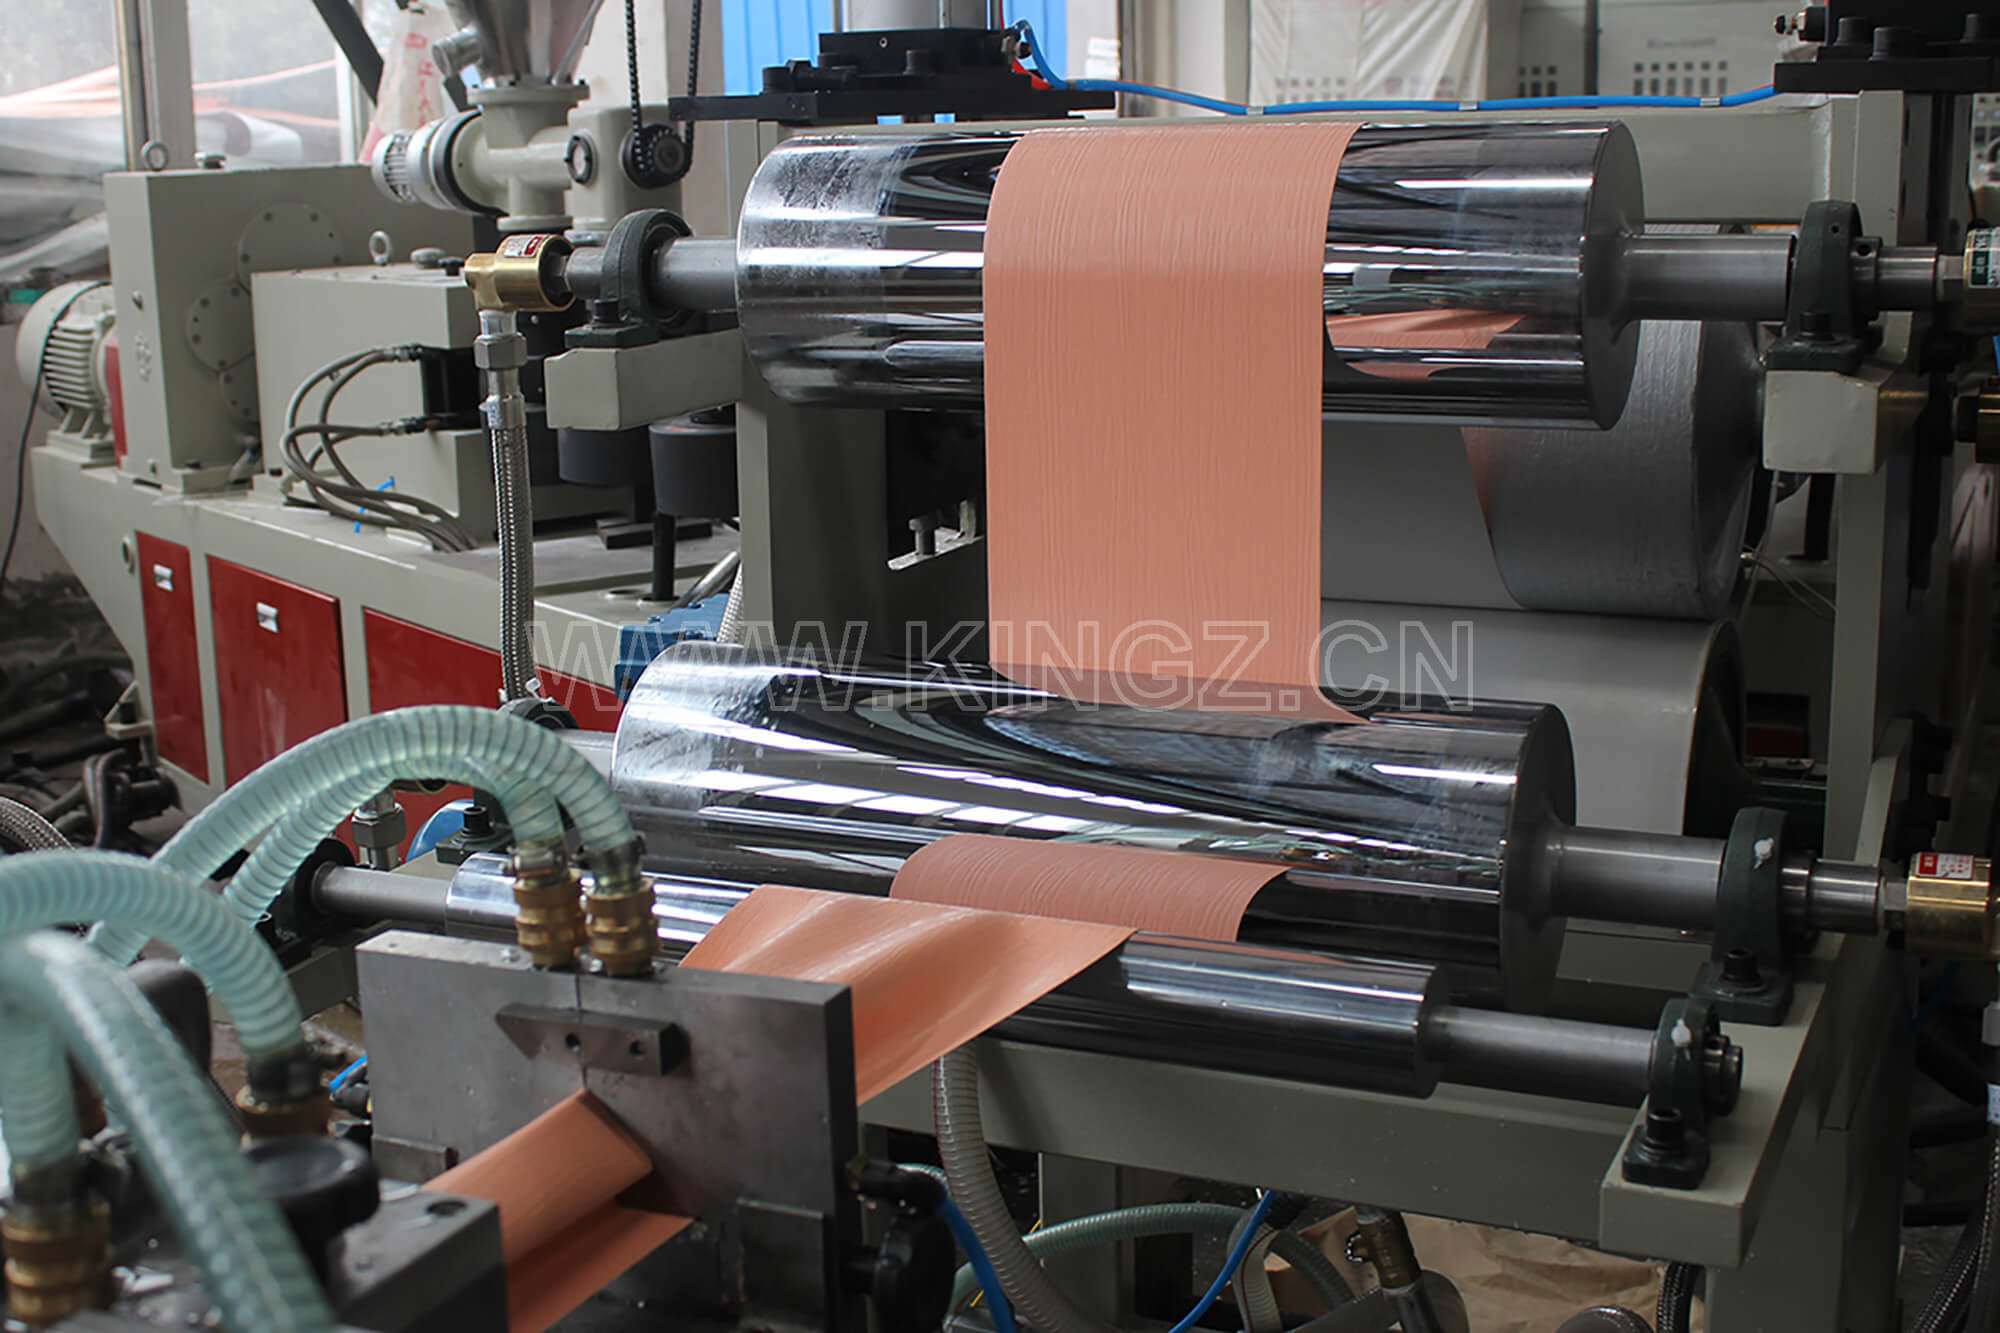 Vinyl-Siding-Extrusion-Line-3